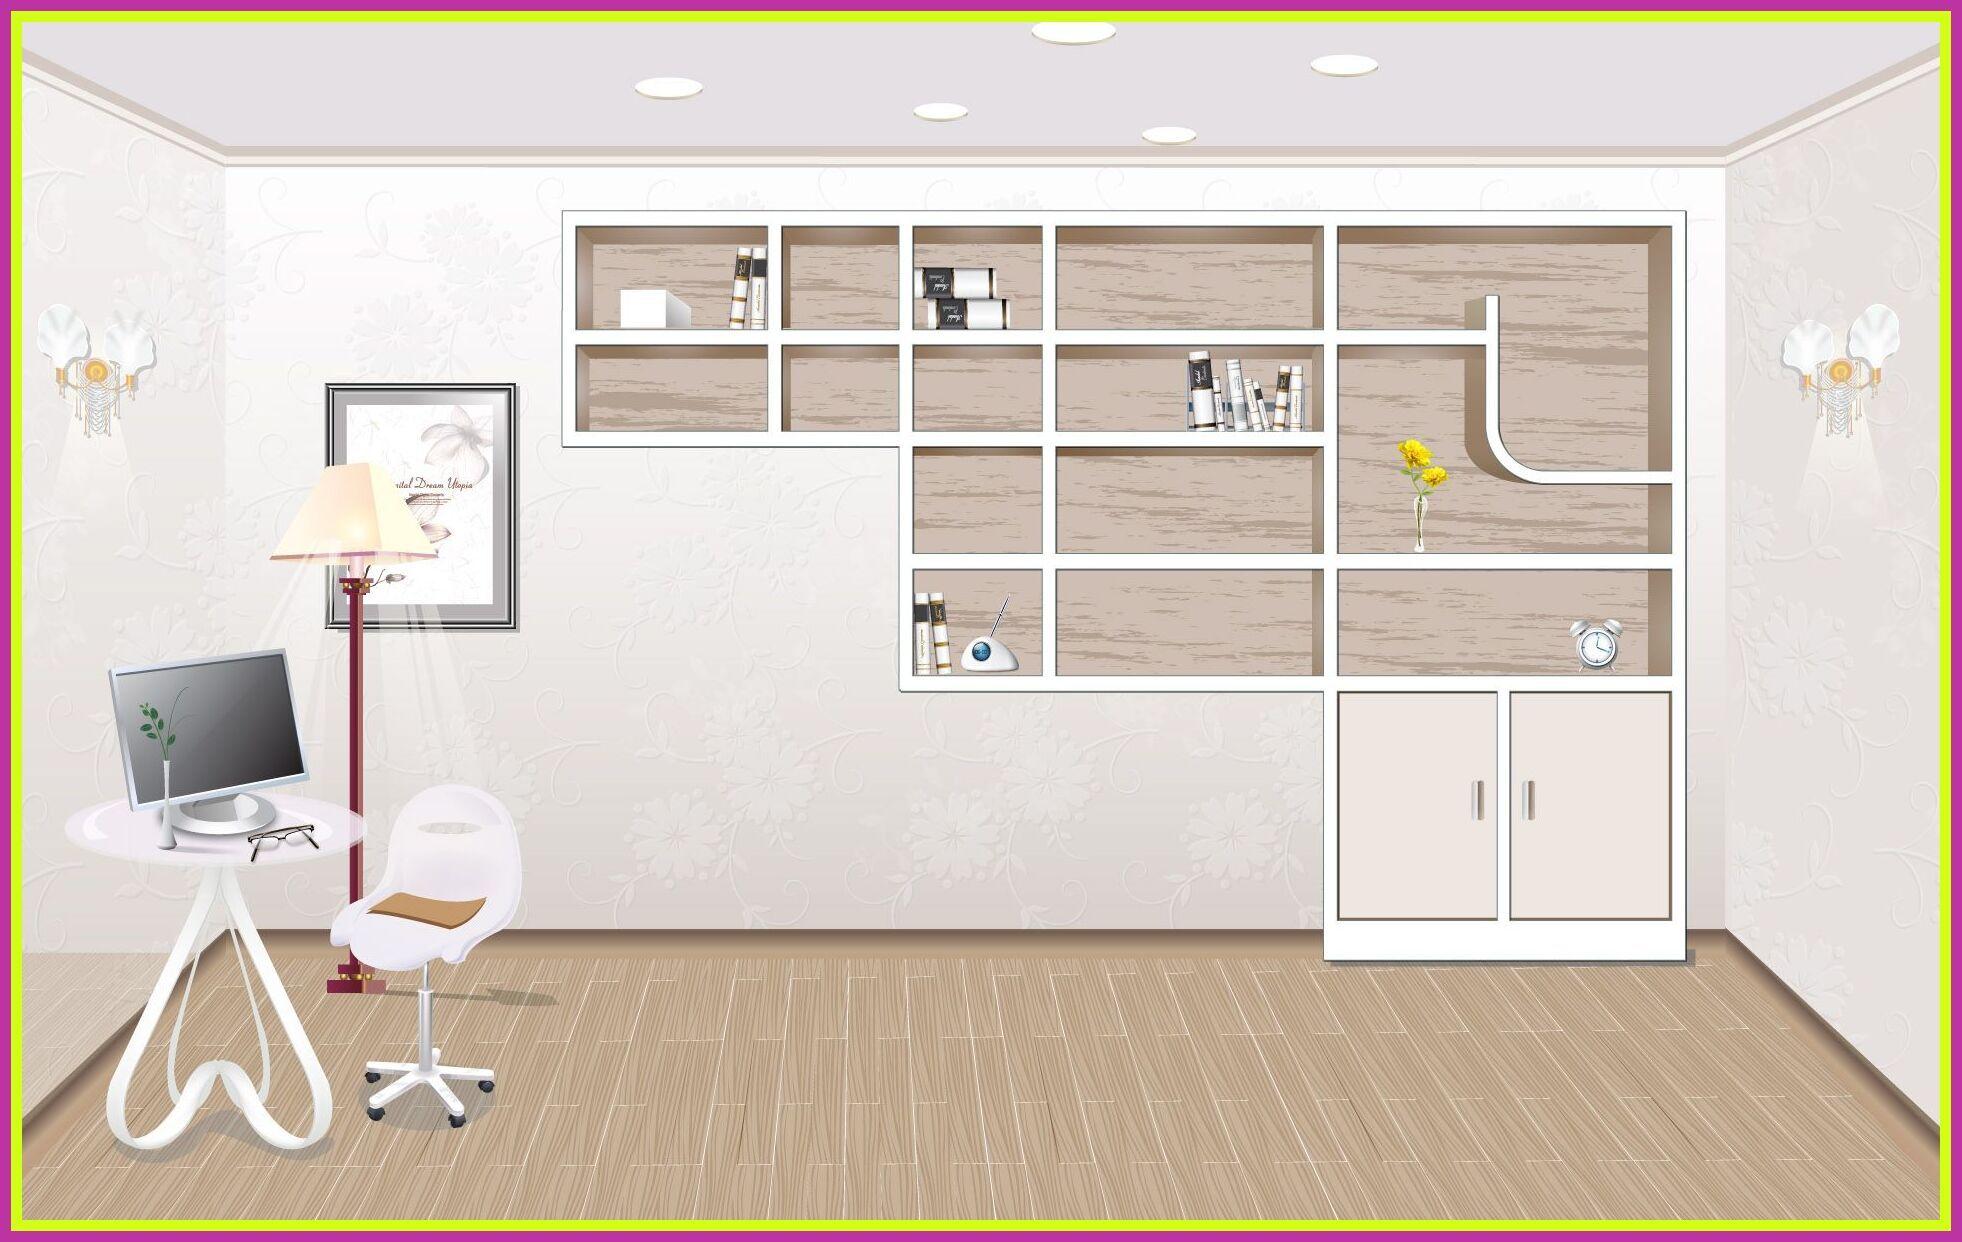 34 Reference Of Bookshelf Desktop Wallpaper Download In 2020 Desktop Shelf Bookshelves Home